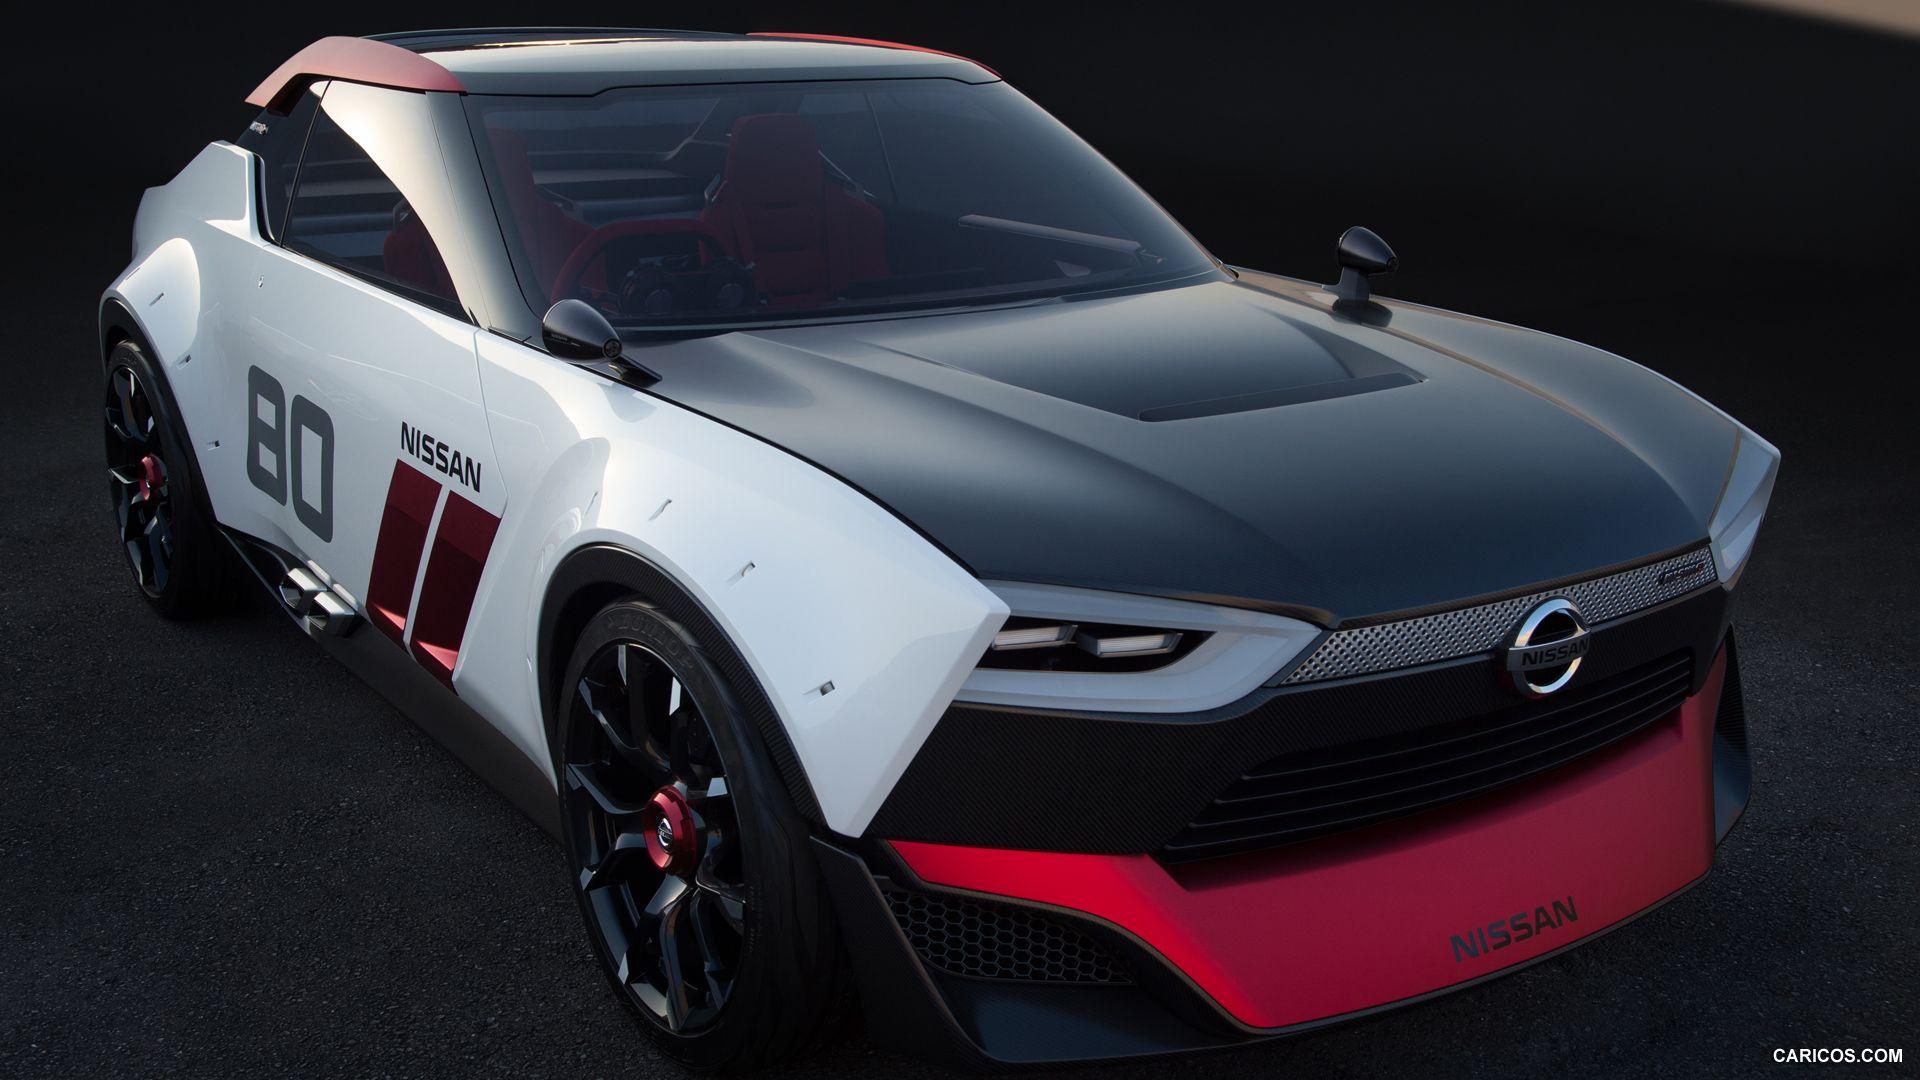 2013 Nissan Idx Nismo Concept Nissan New Nissan Car